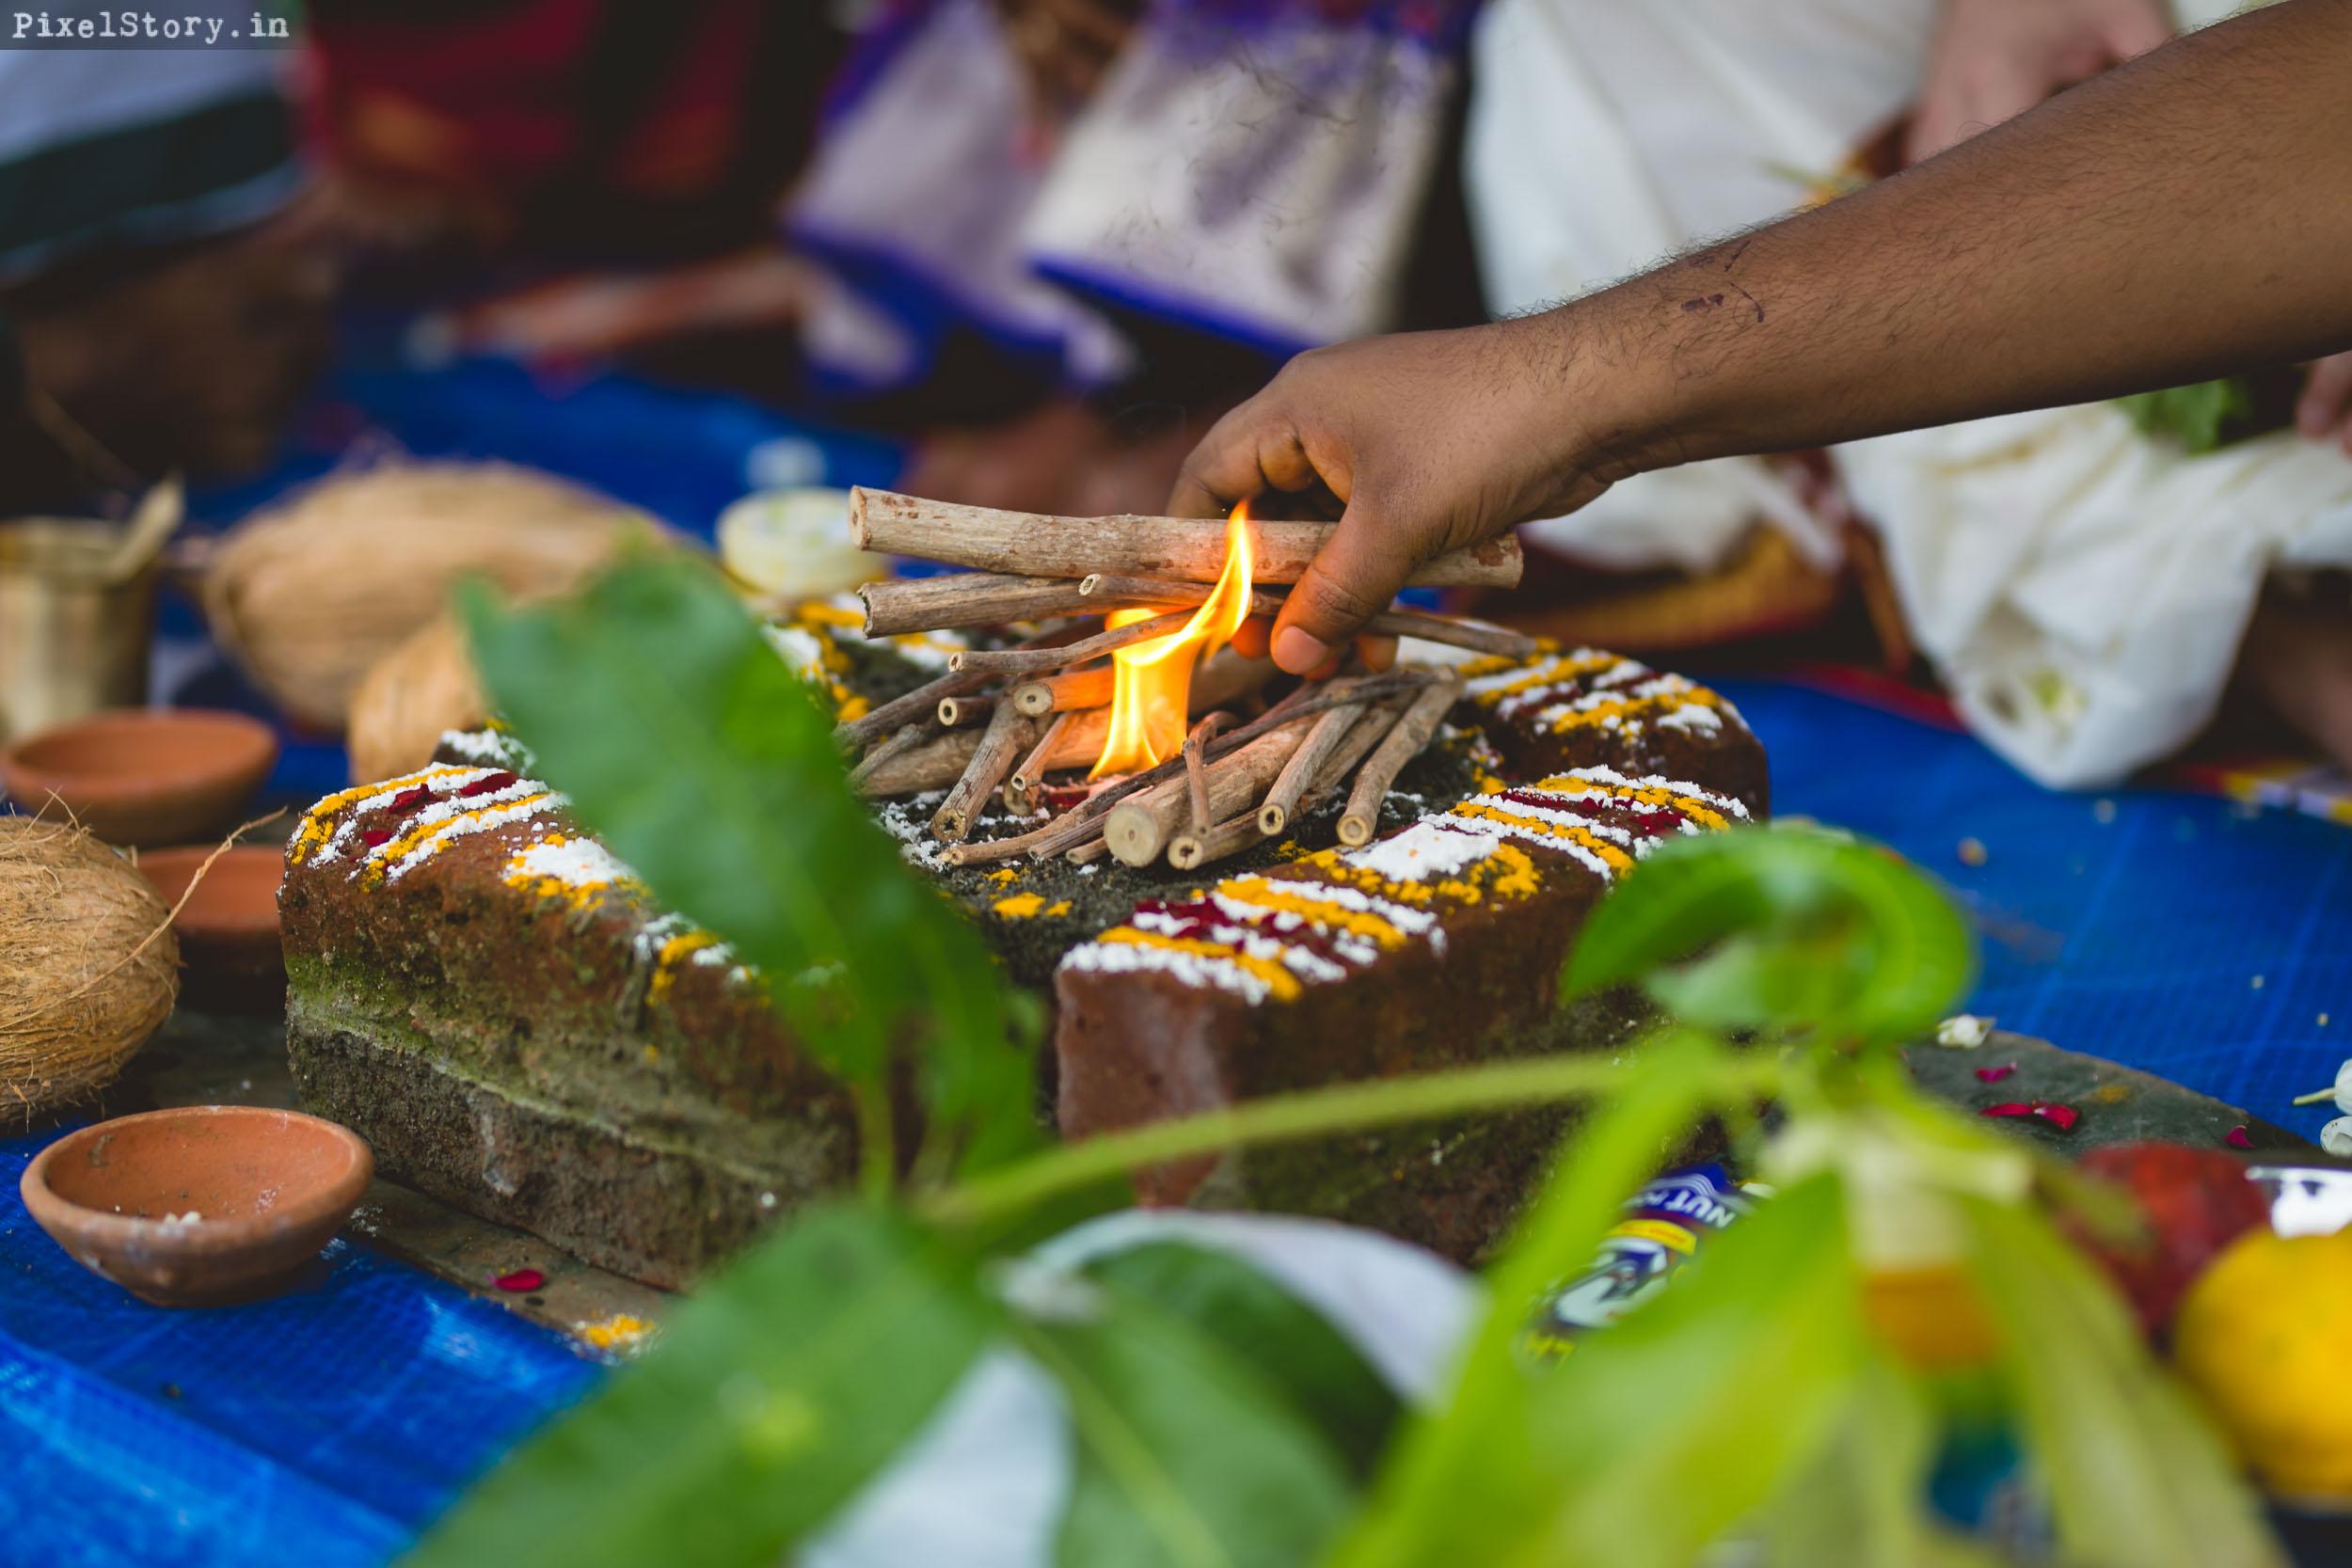 PixelStory-Jungle-Wedding-Photographer-Masinagudi-Indo-French055.jpg